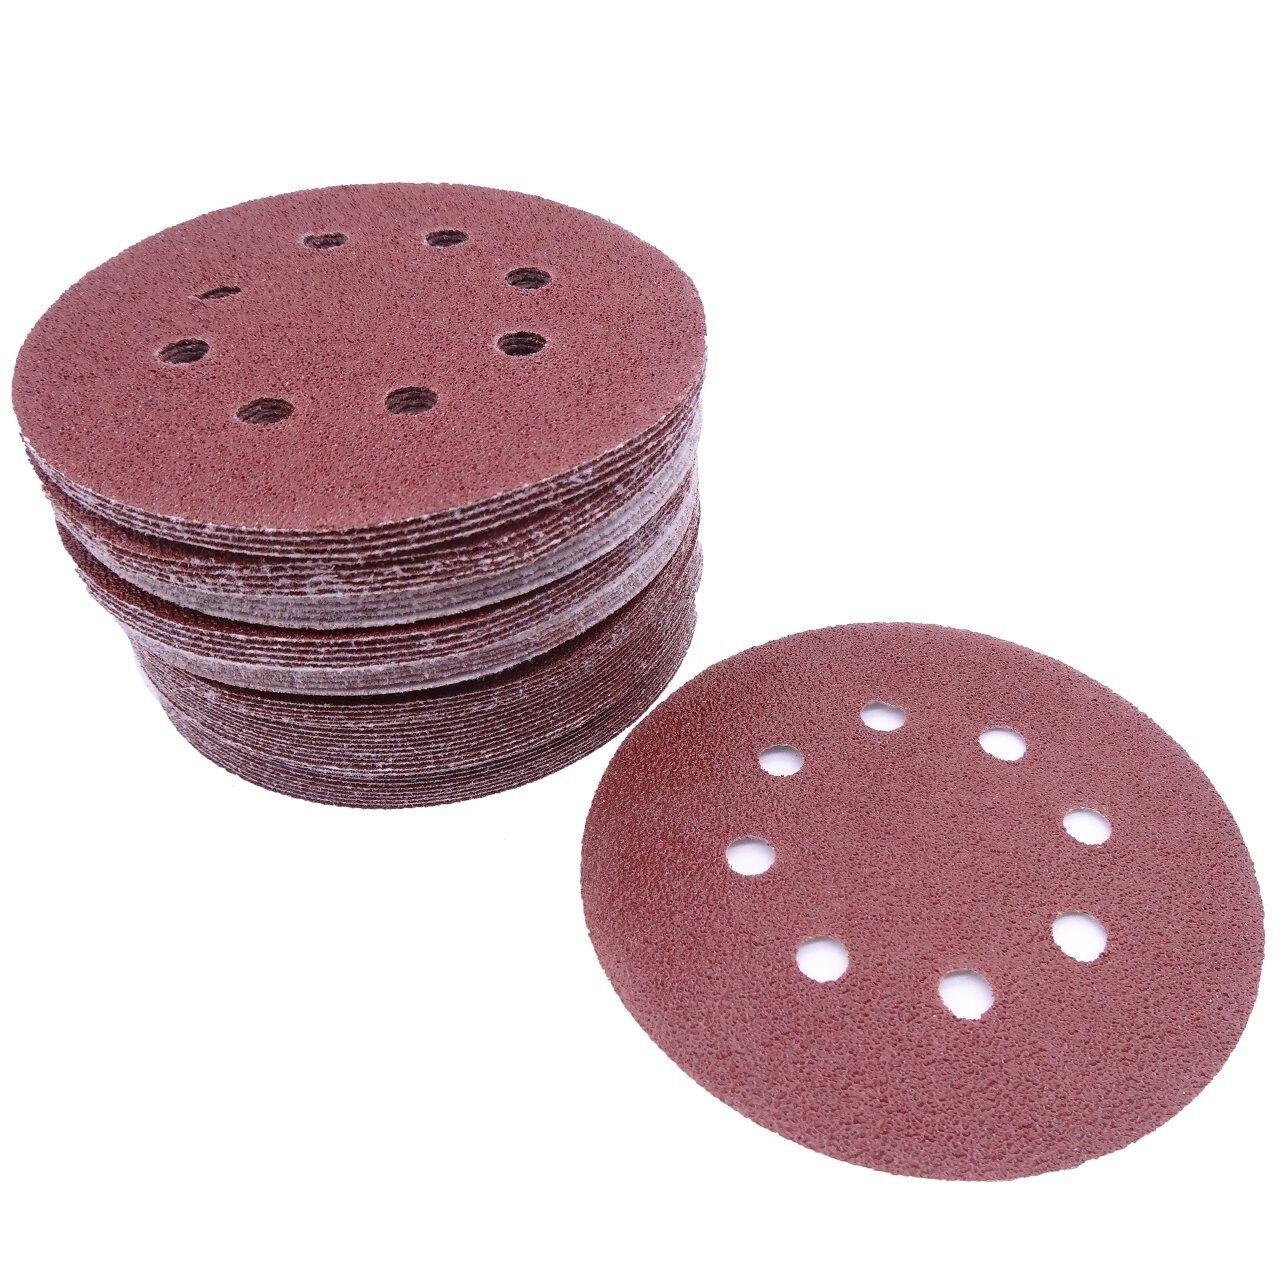 MYLB-50 pcs 5 inch 8 Hole 80 Grit Mix Sanding Disc Random Orbit Sandpaper Buckle Sander